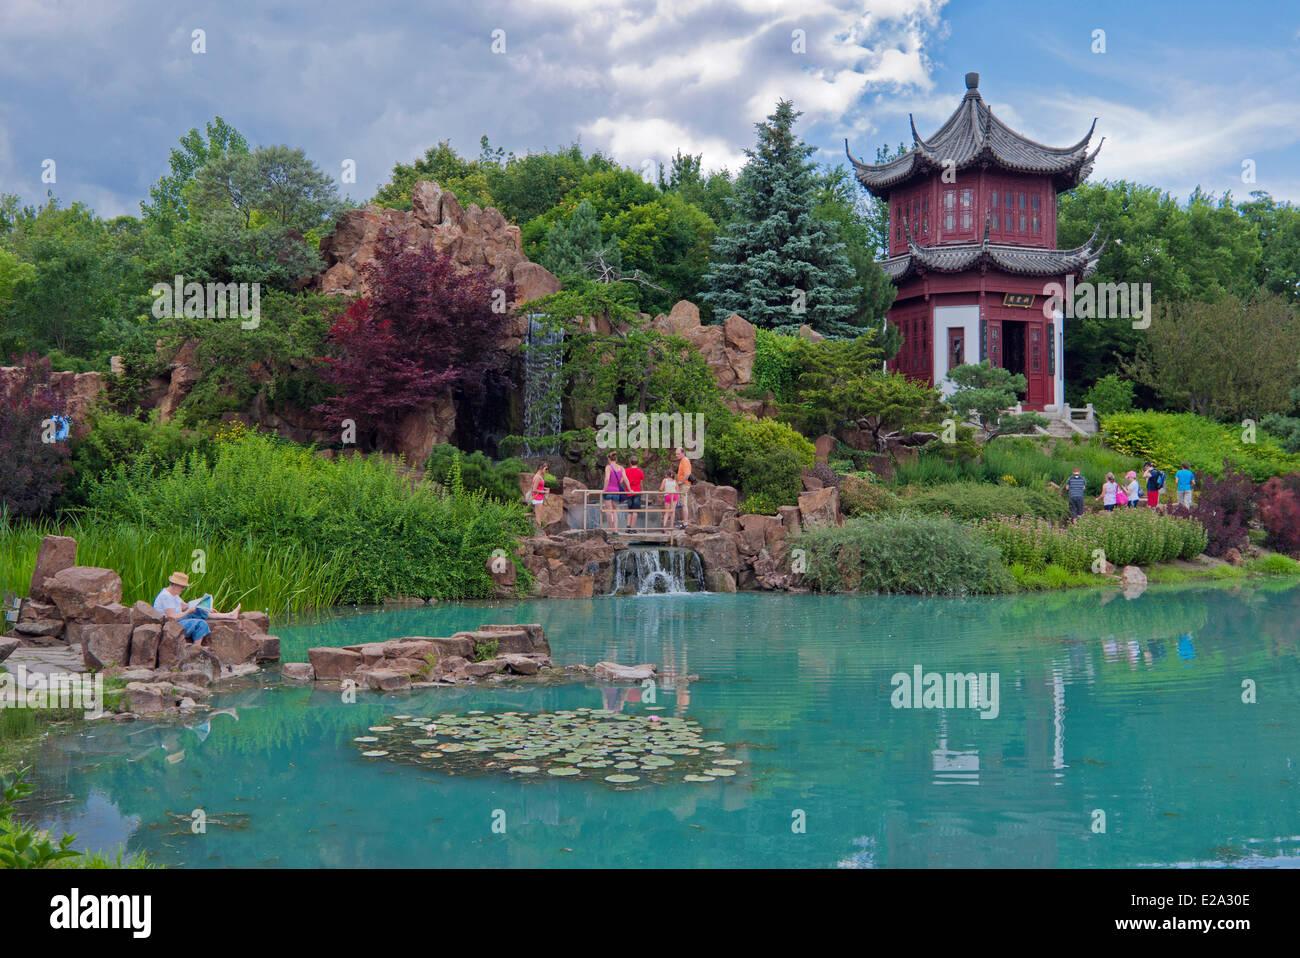 Canada, Quebec Province, Montreal, Botanical Garden, Chinese Garden - Stock Image